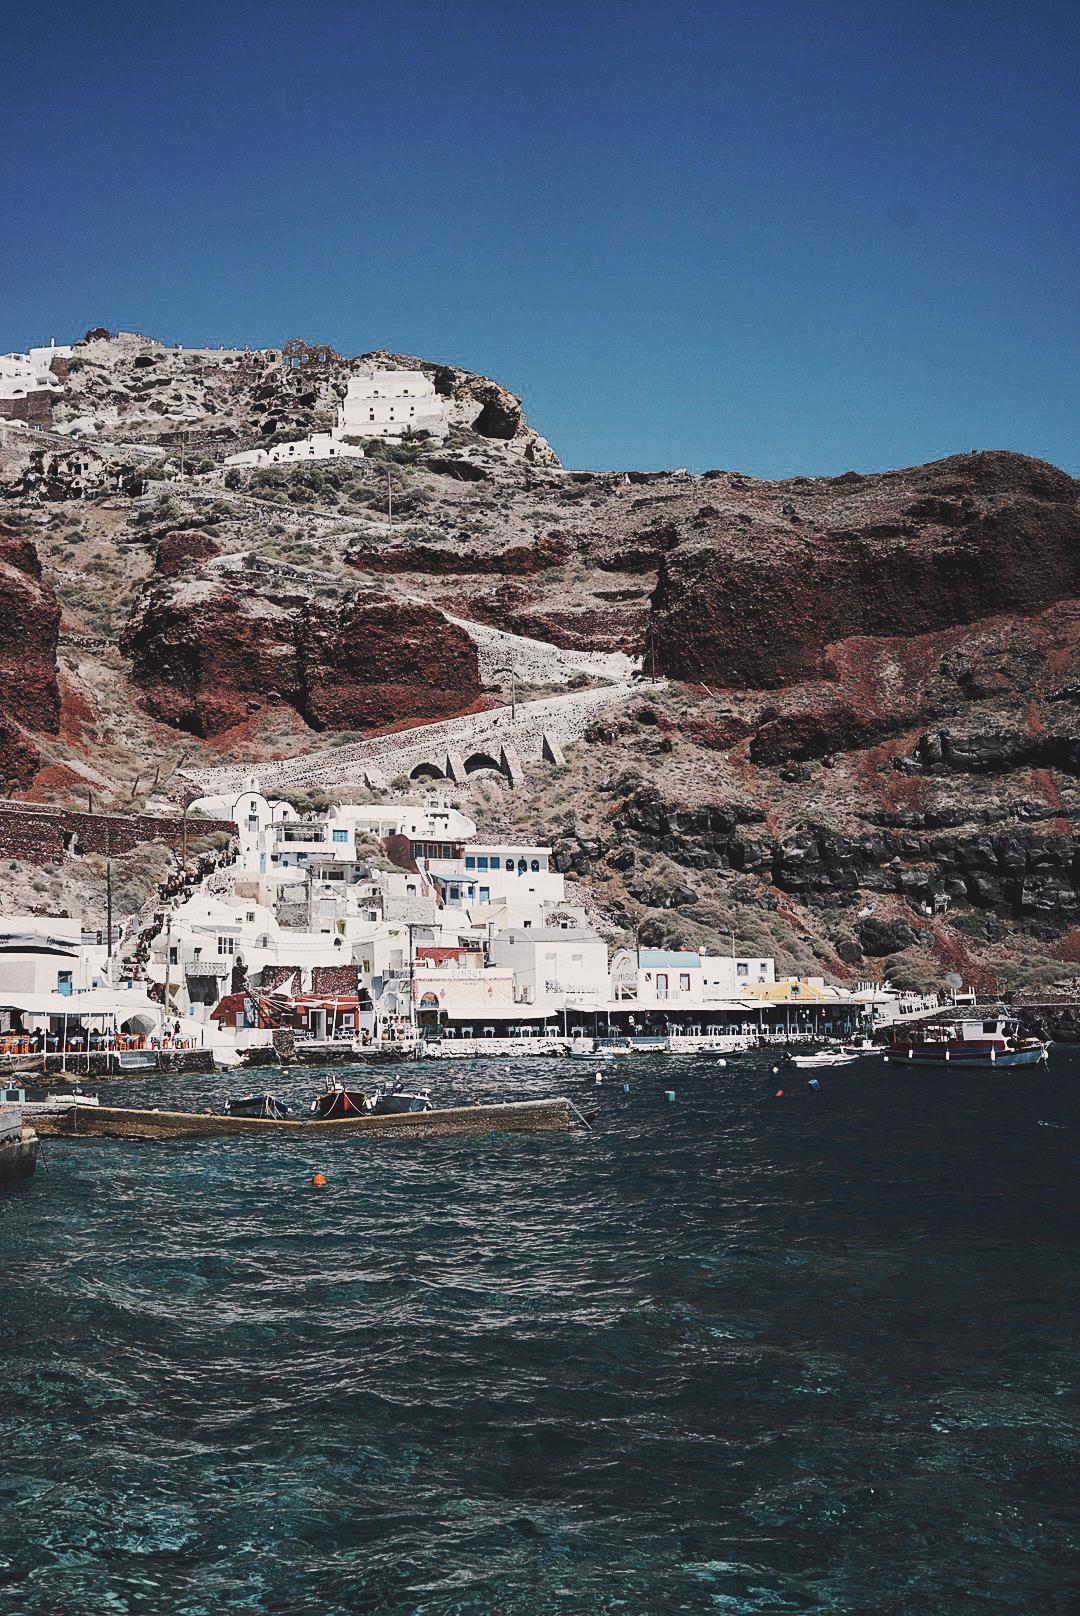 Soludos_Escapes-Boat_Trip-Bikini-Summer_Look-Santorini_Greece-GRLFRND_Jeans-Off_The_Shoulders-Collage_Vintage-Street_Style-Soludos_Espadrilles-16